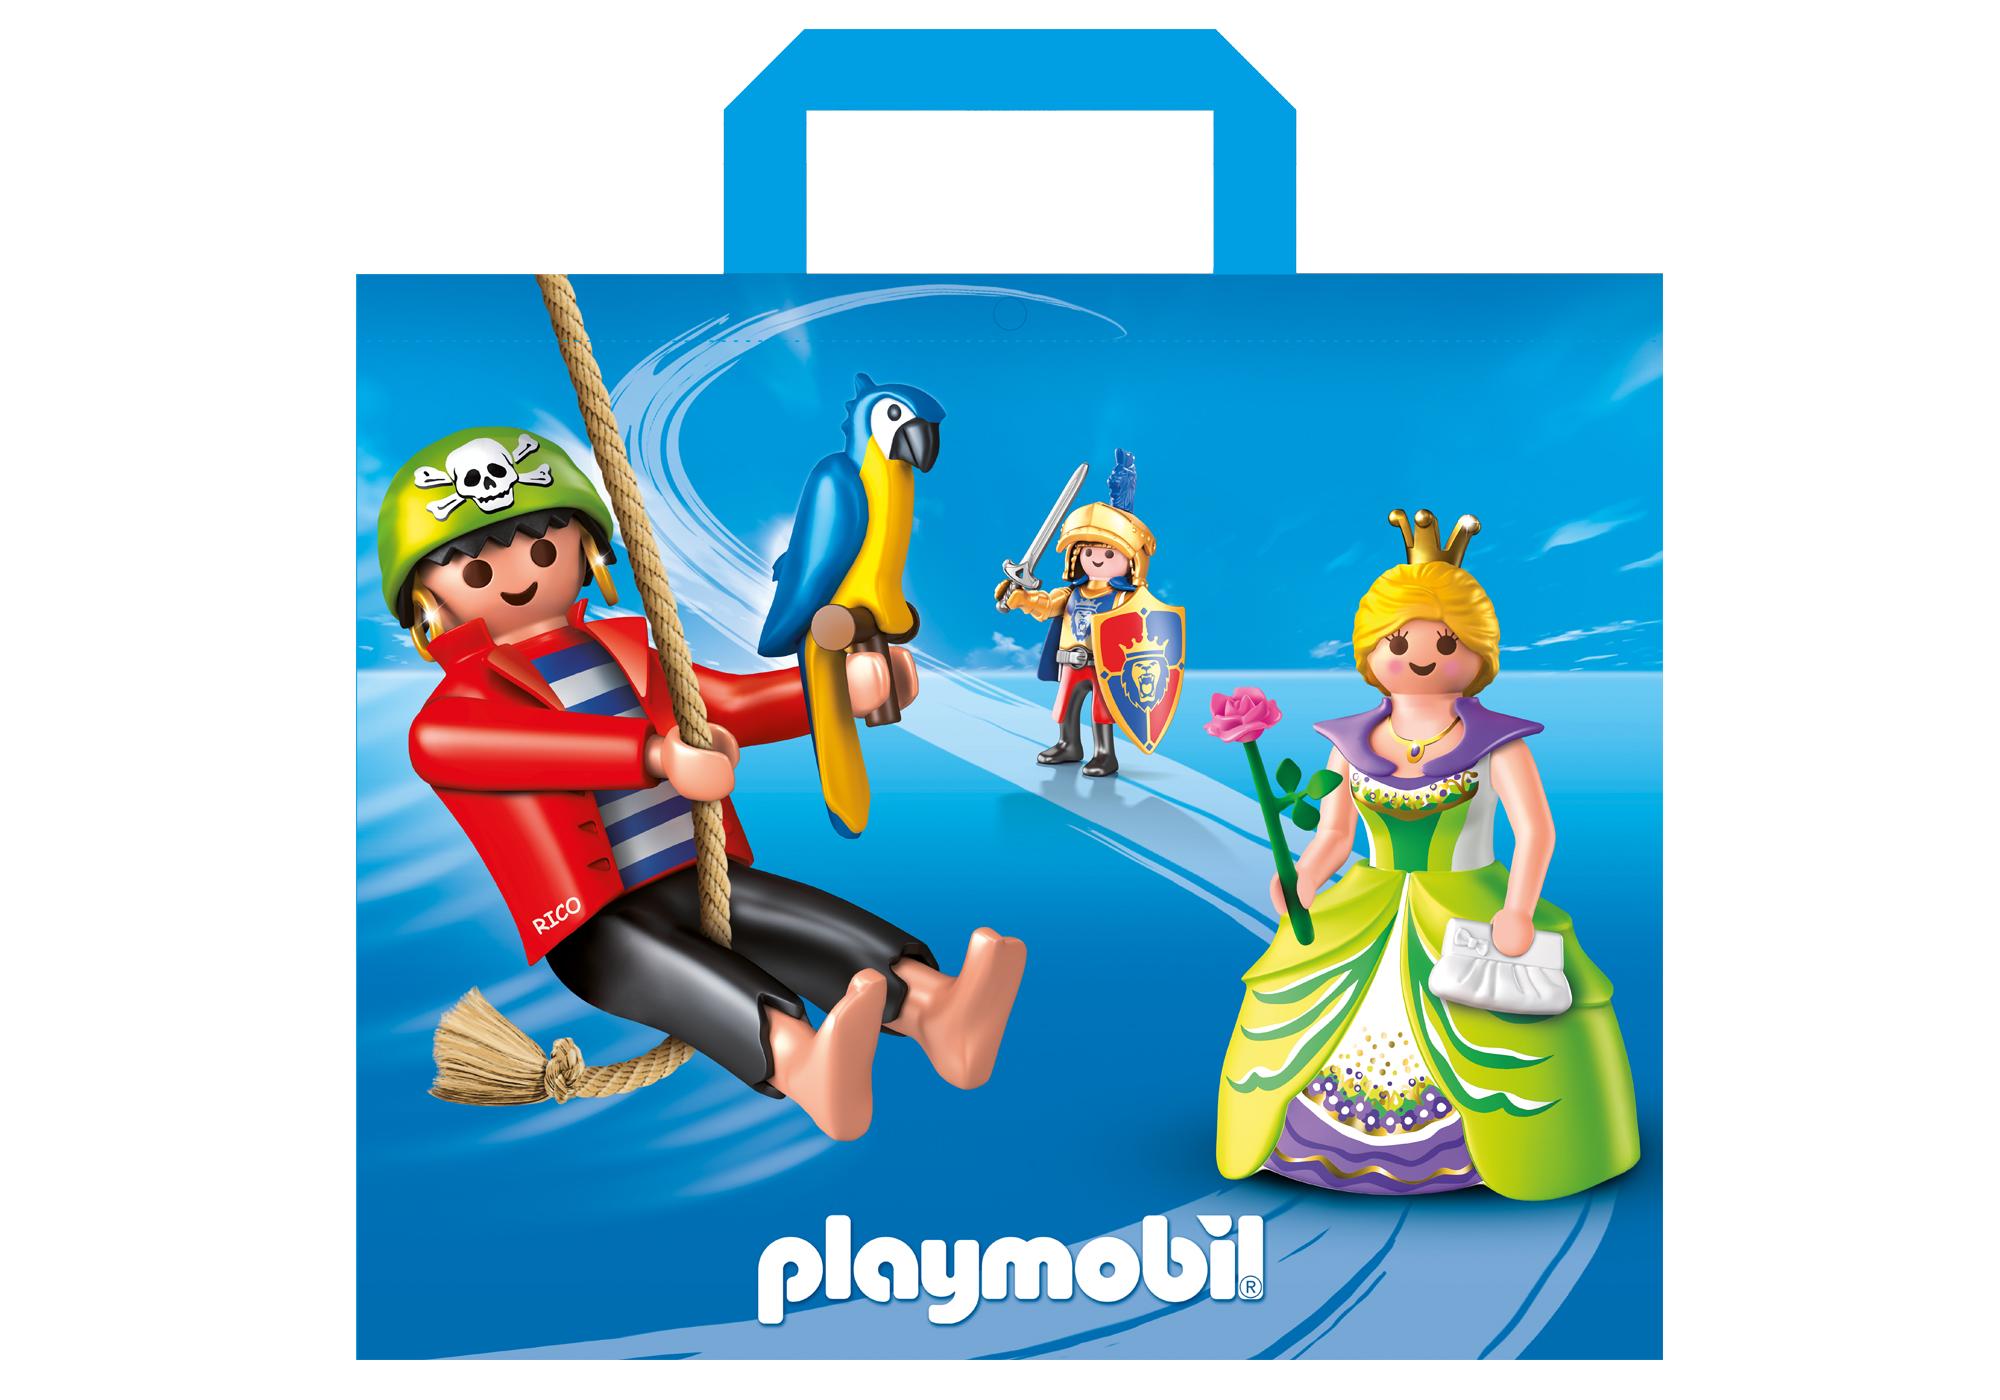 http://media.playmobil.com/i/playmobil/86483_product_detail/Bolsa Compra XXL